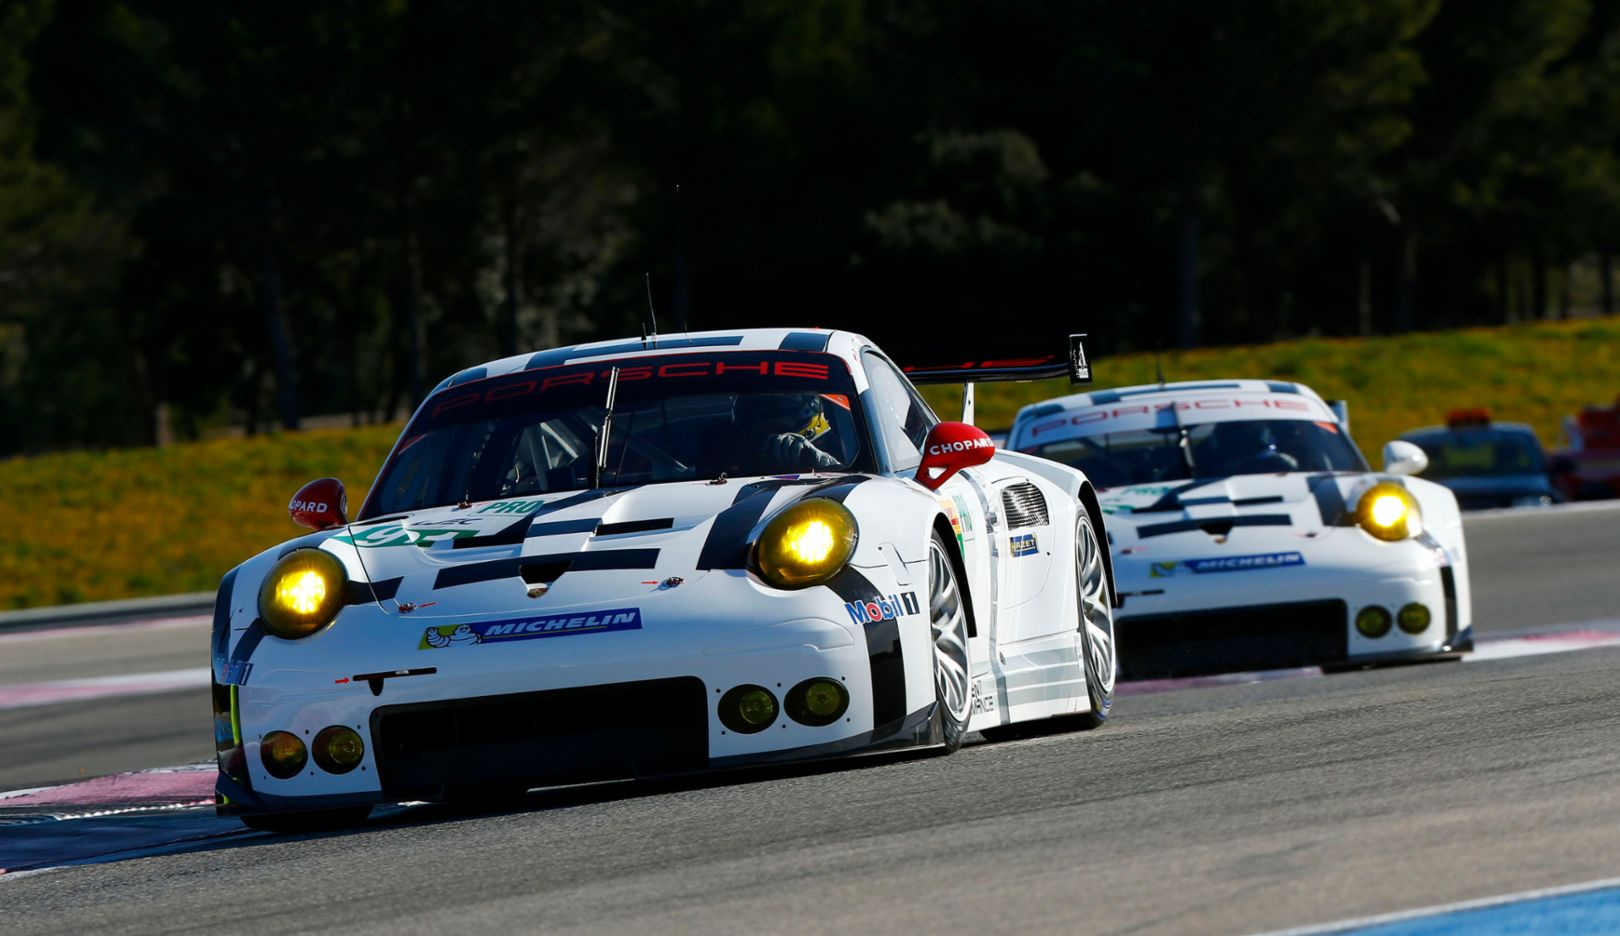 Porsche 911 RSR (91), Porsche Team Manthey, 2015, Porsche AG